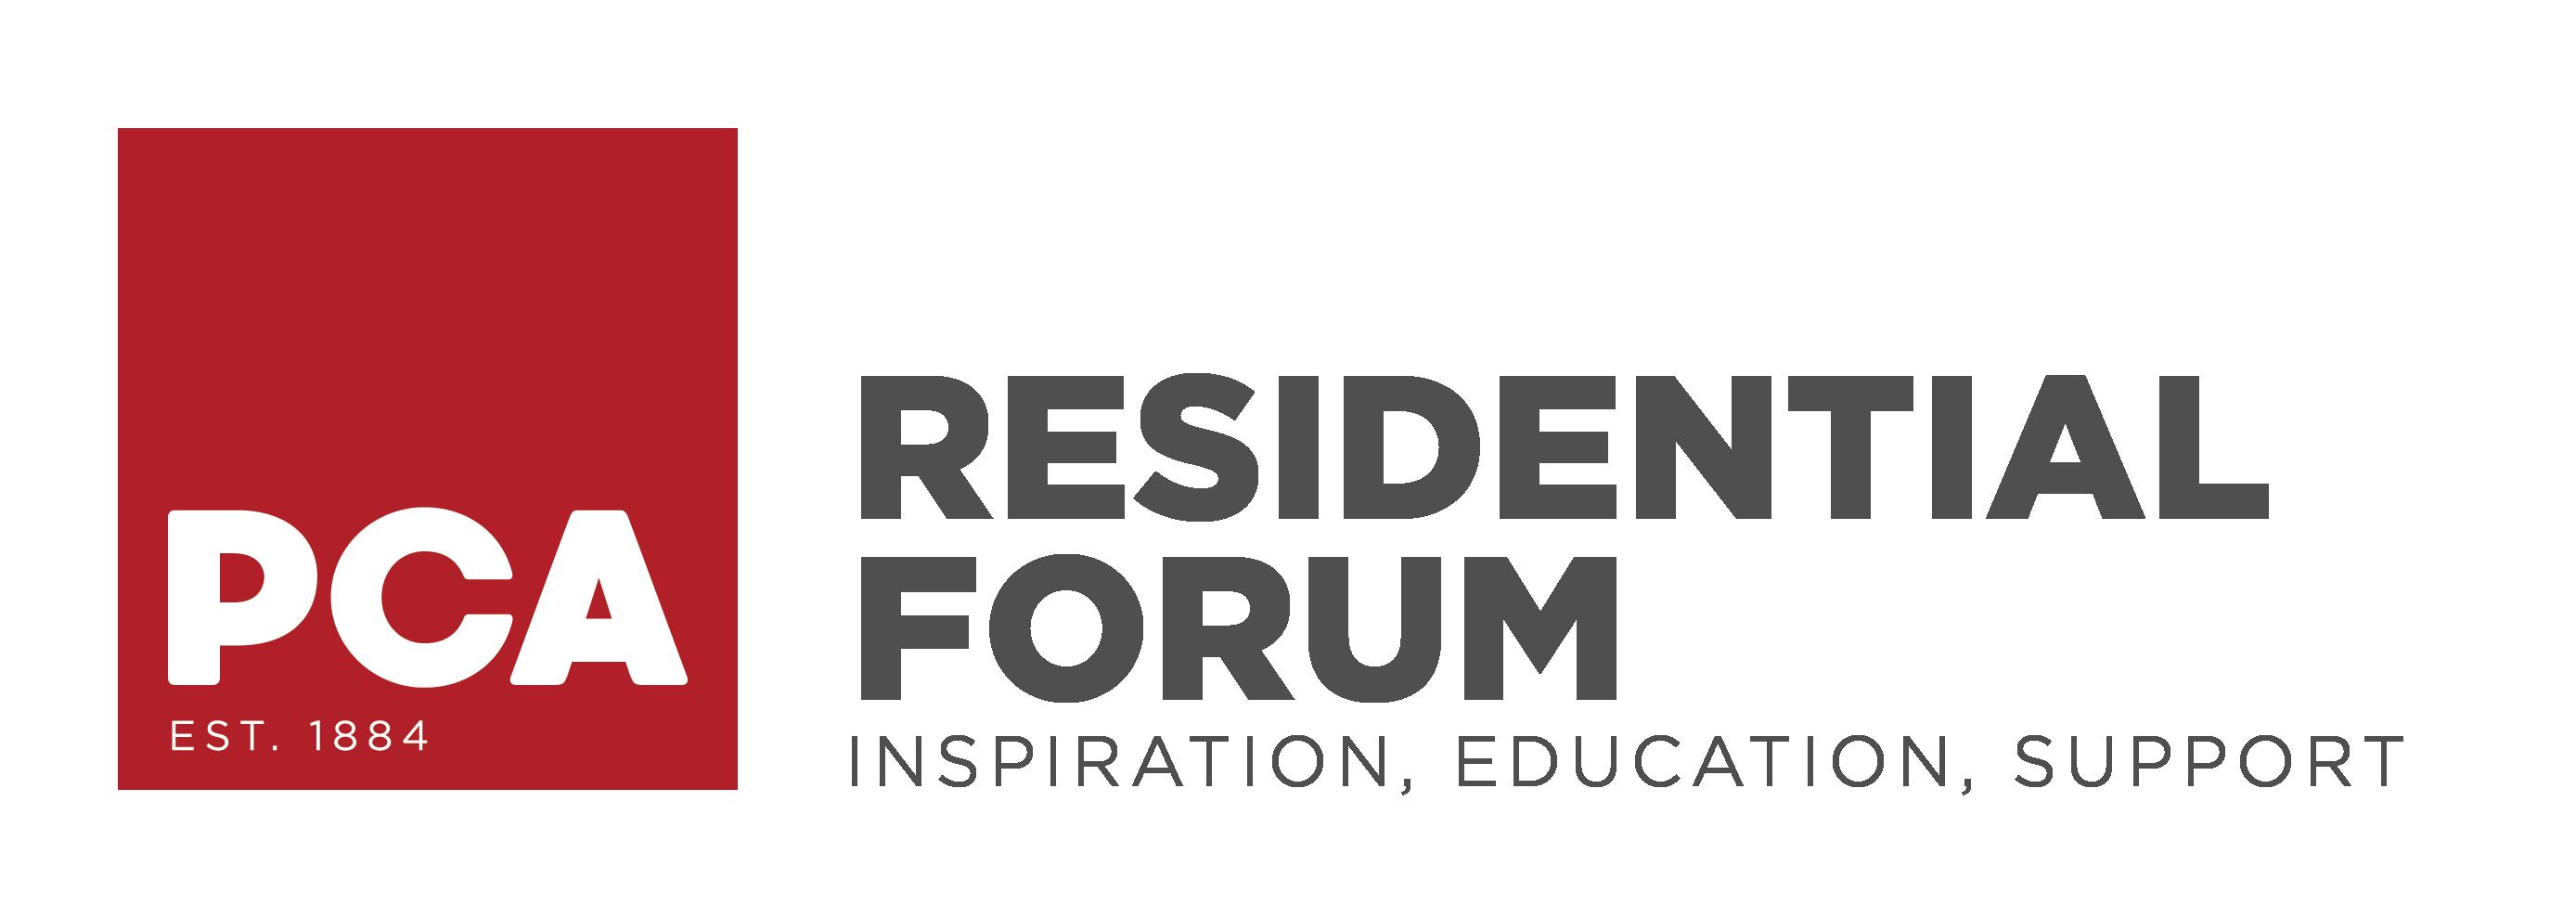 PCA Residential Forum logo